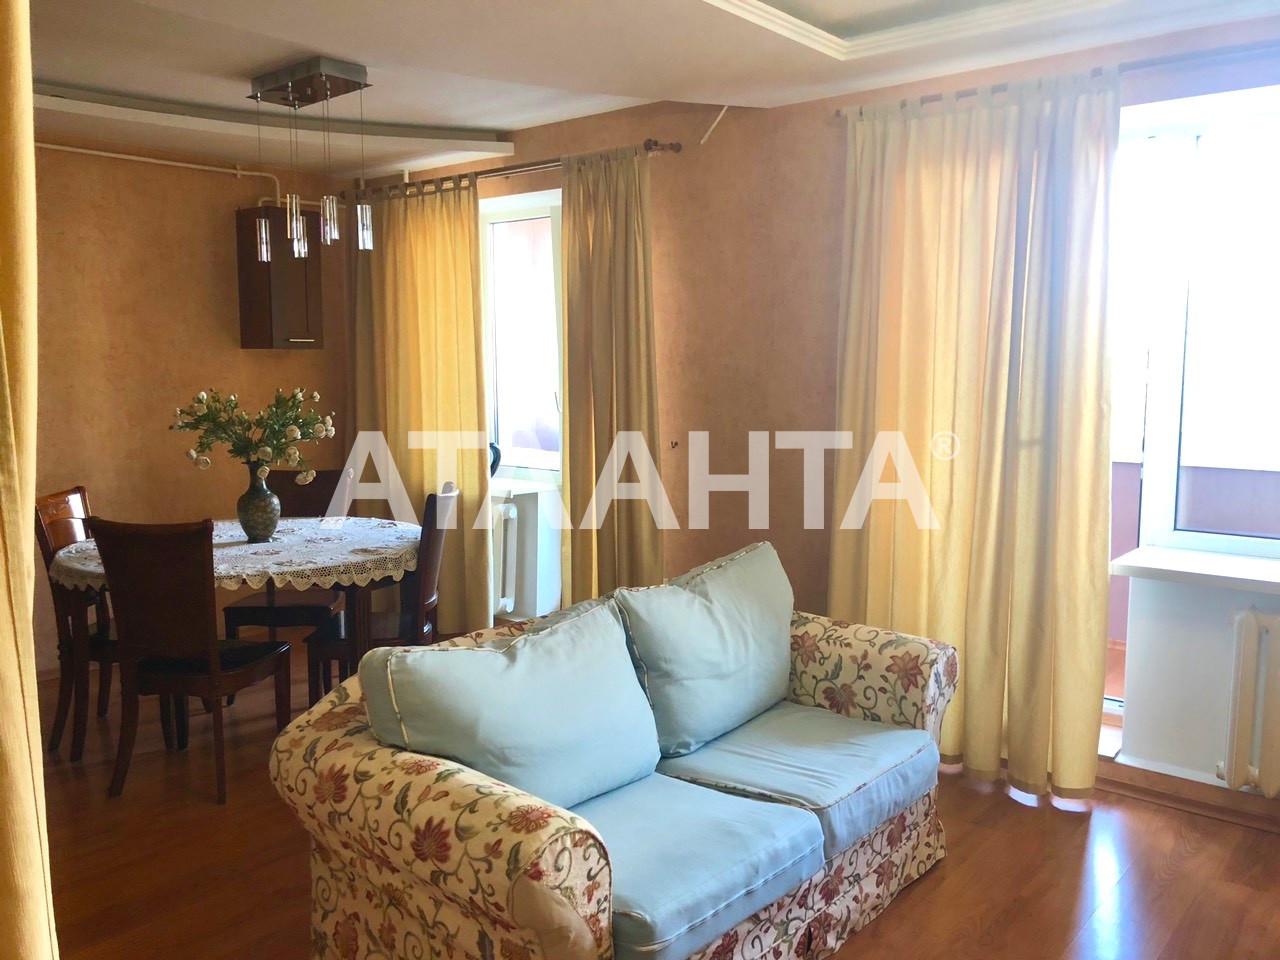 Продается 1-комнатная Квартира на ул. Вишневского Ген. Пер. — 40 999 у.е. (фото №9)